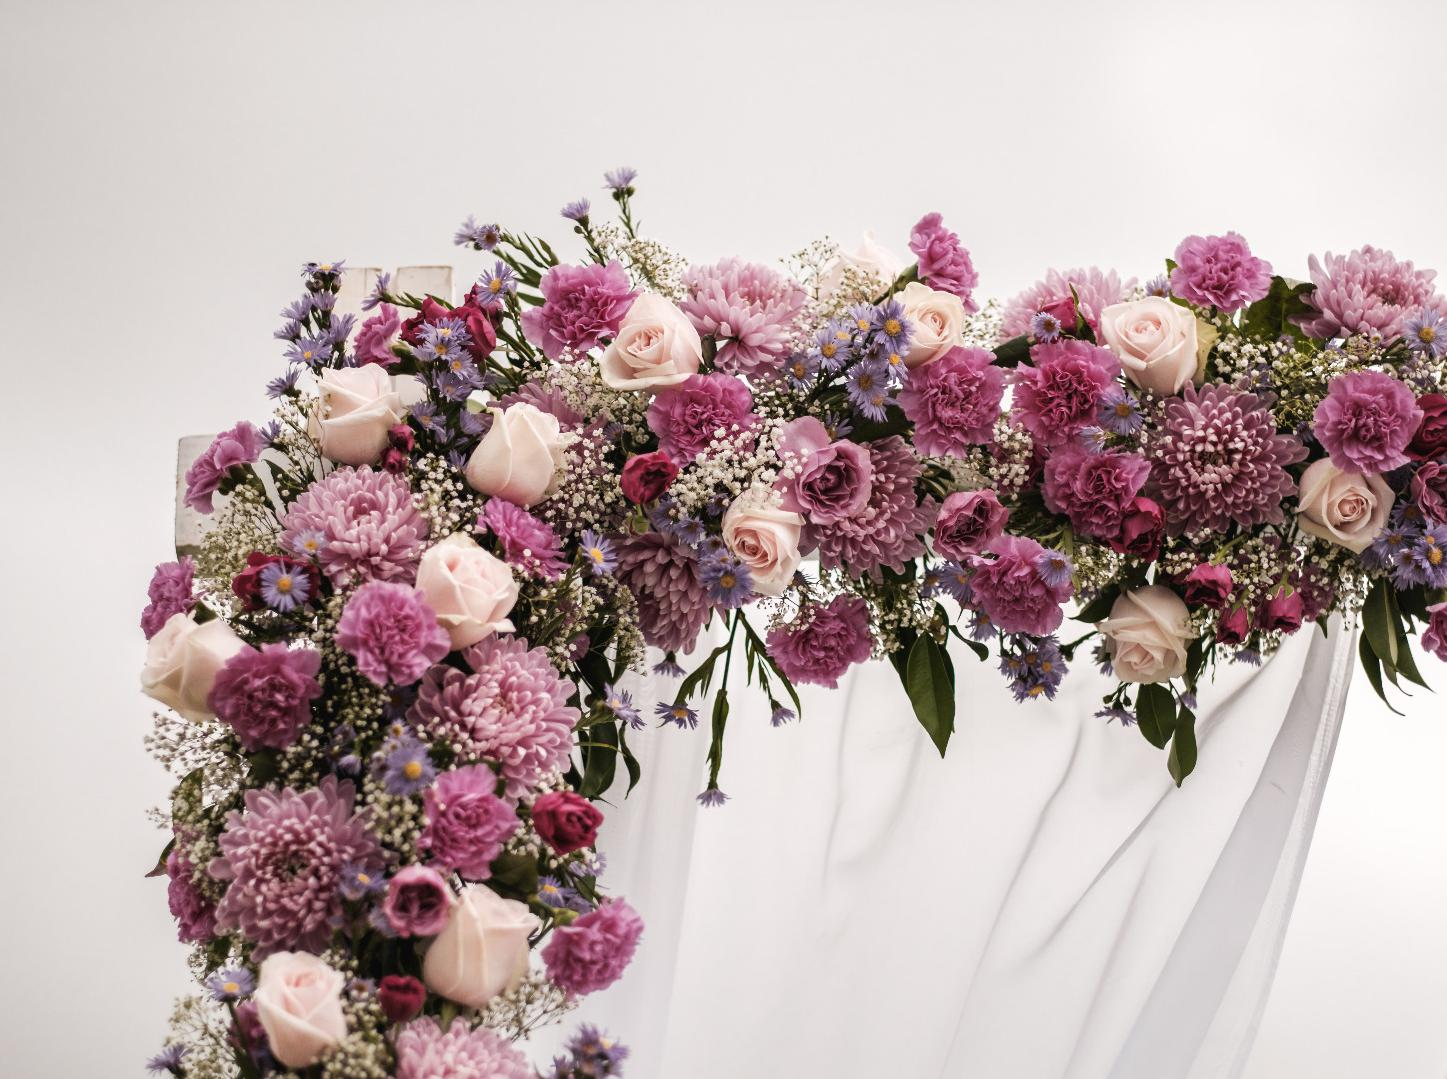 bodas-sin-clasificar-sin-tema-cuba-35502.jpg